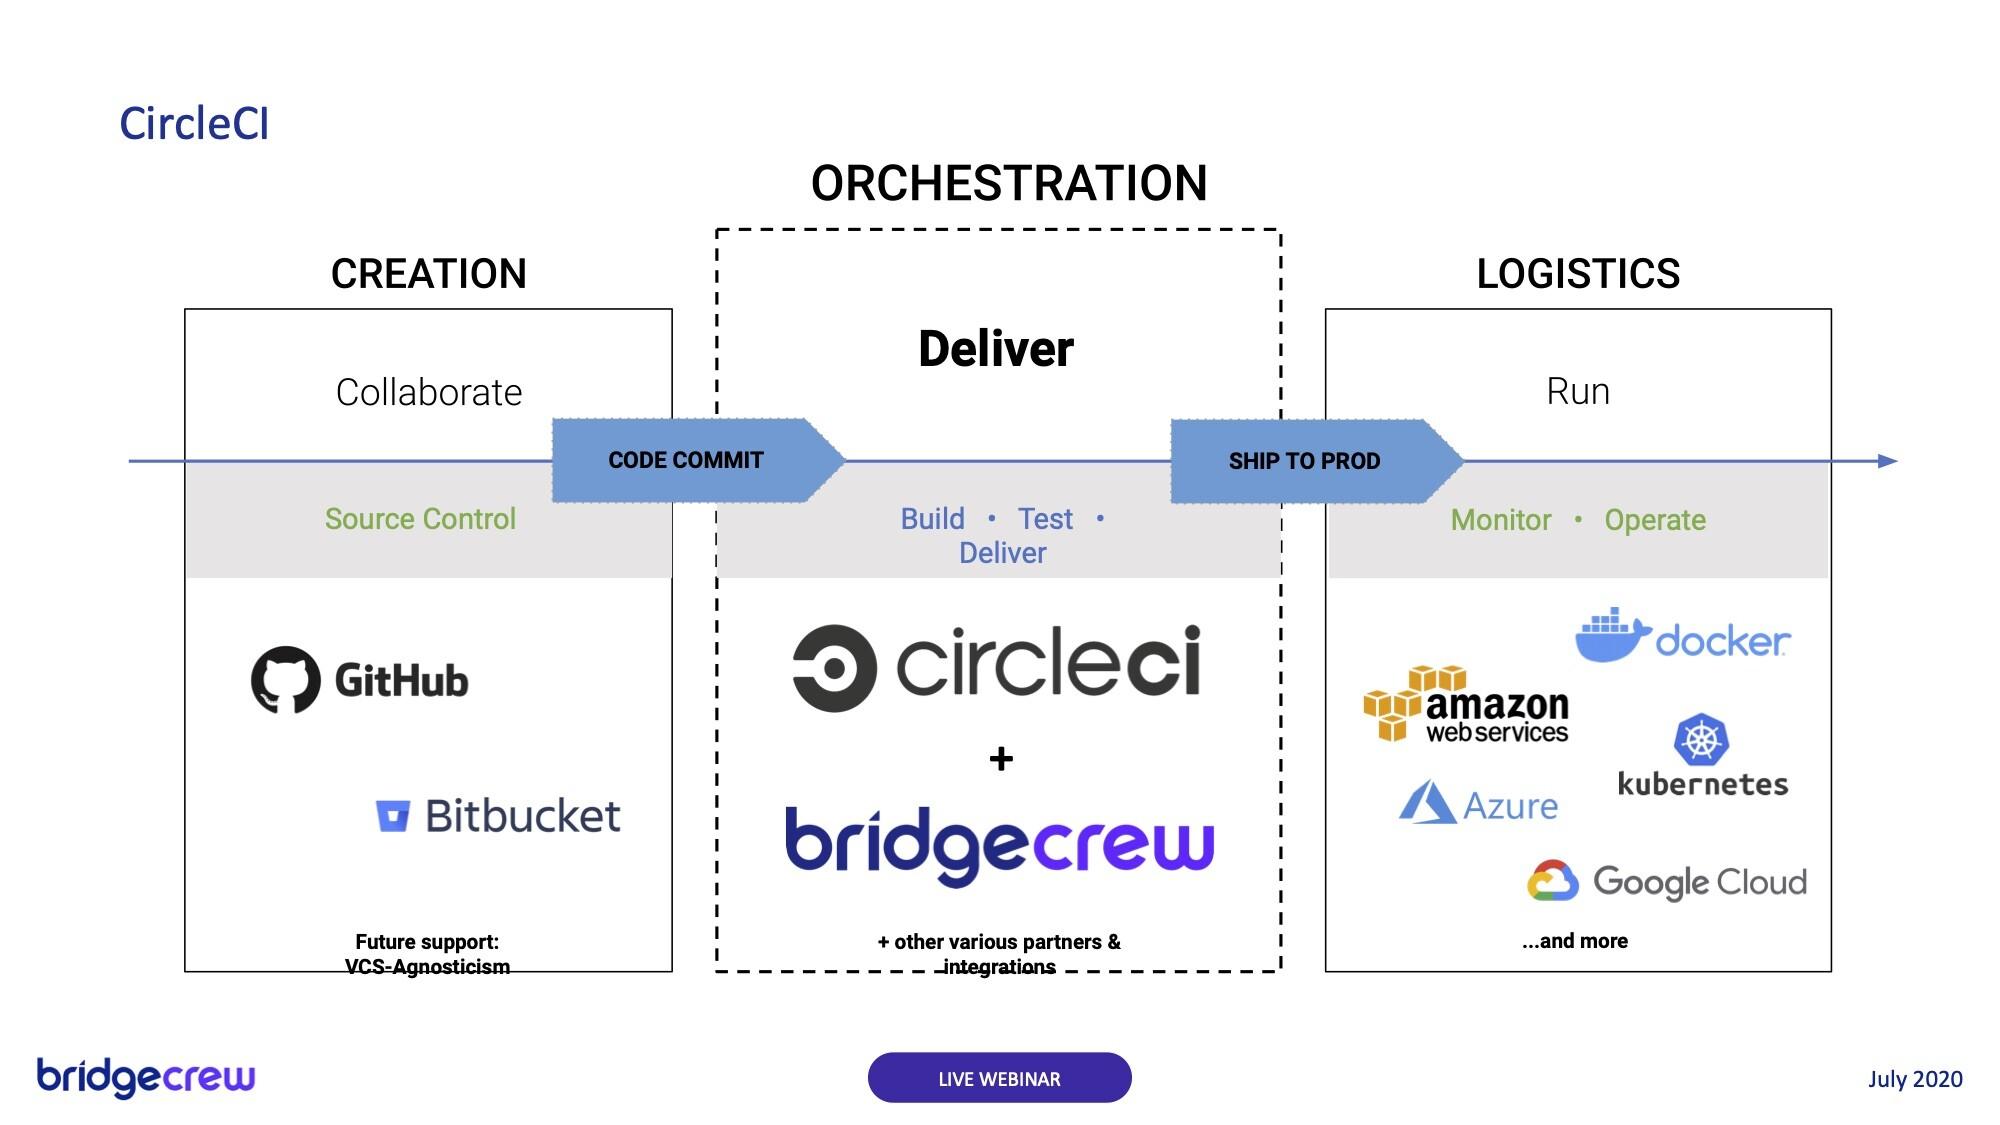 Bridgecrew and CircleCI